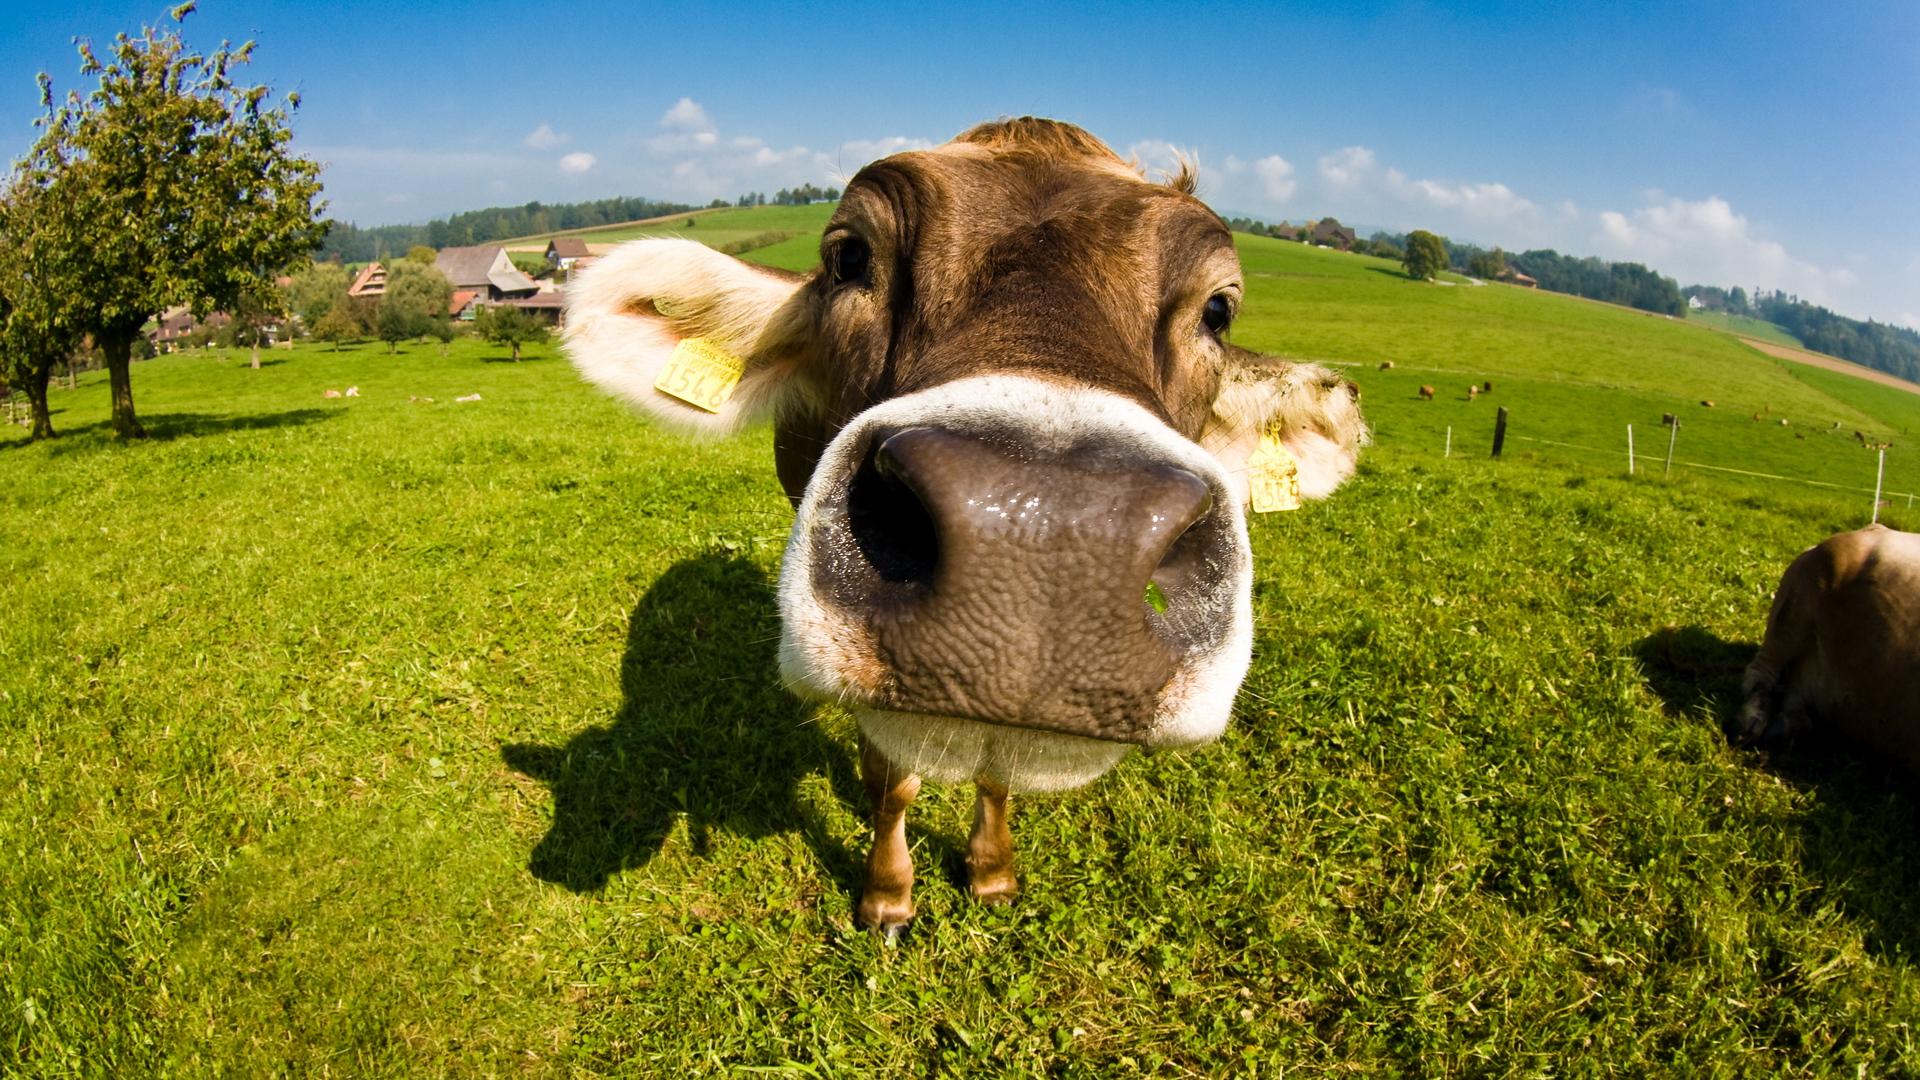 Cow Close Up Wallpaper 22330